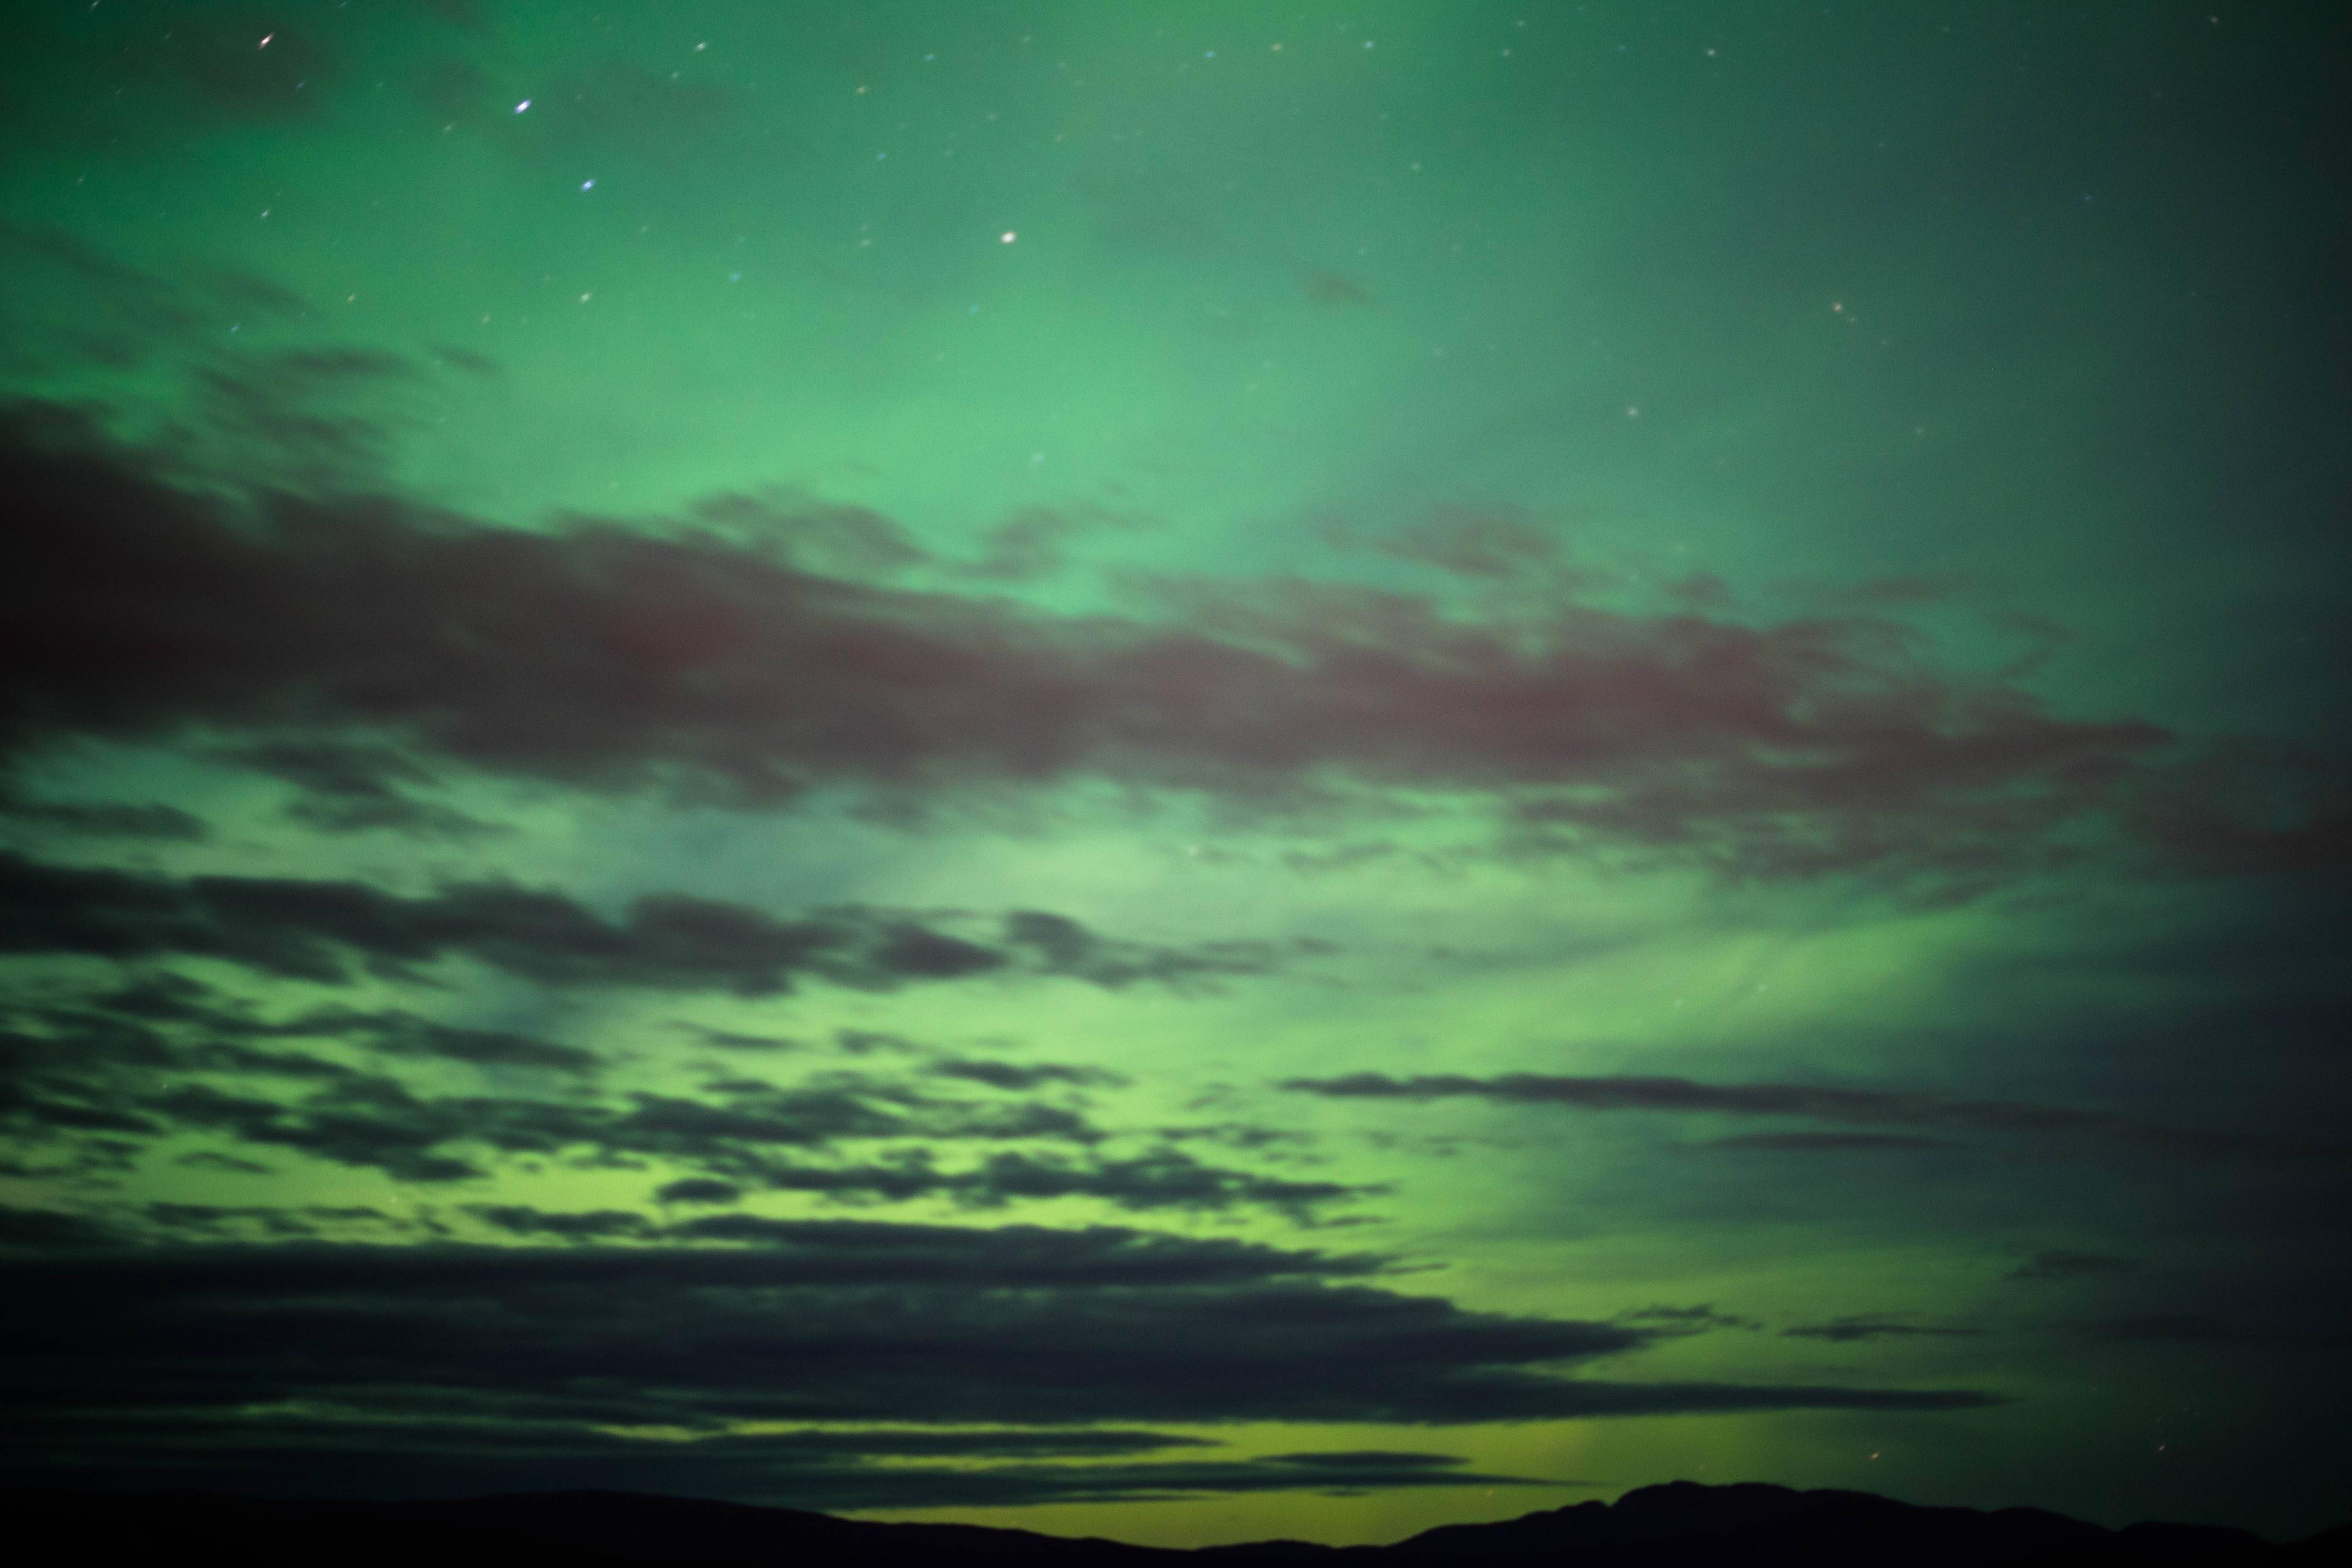 Northern lights in Whitehorse Yukon 10/8/16 [5598x3732] [OC]